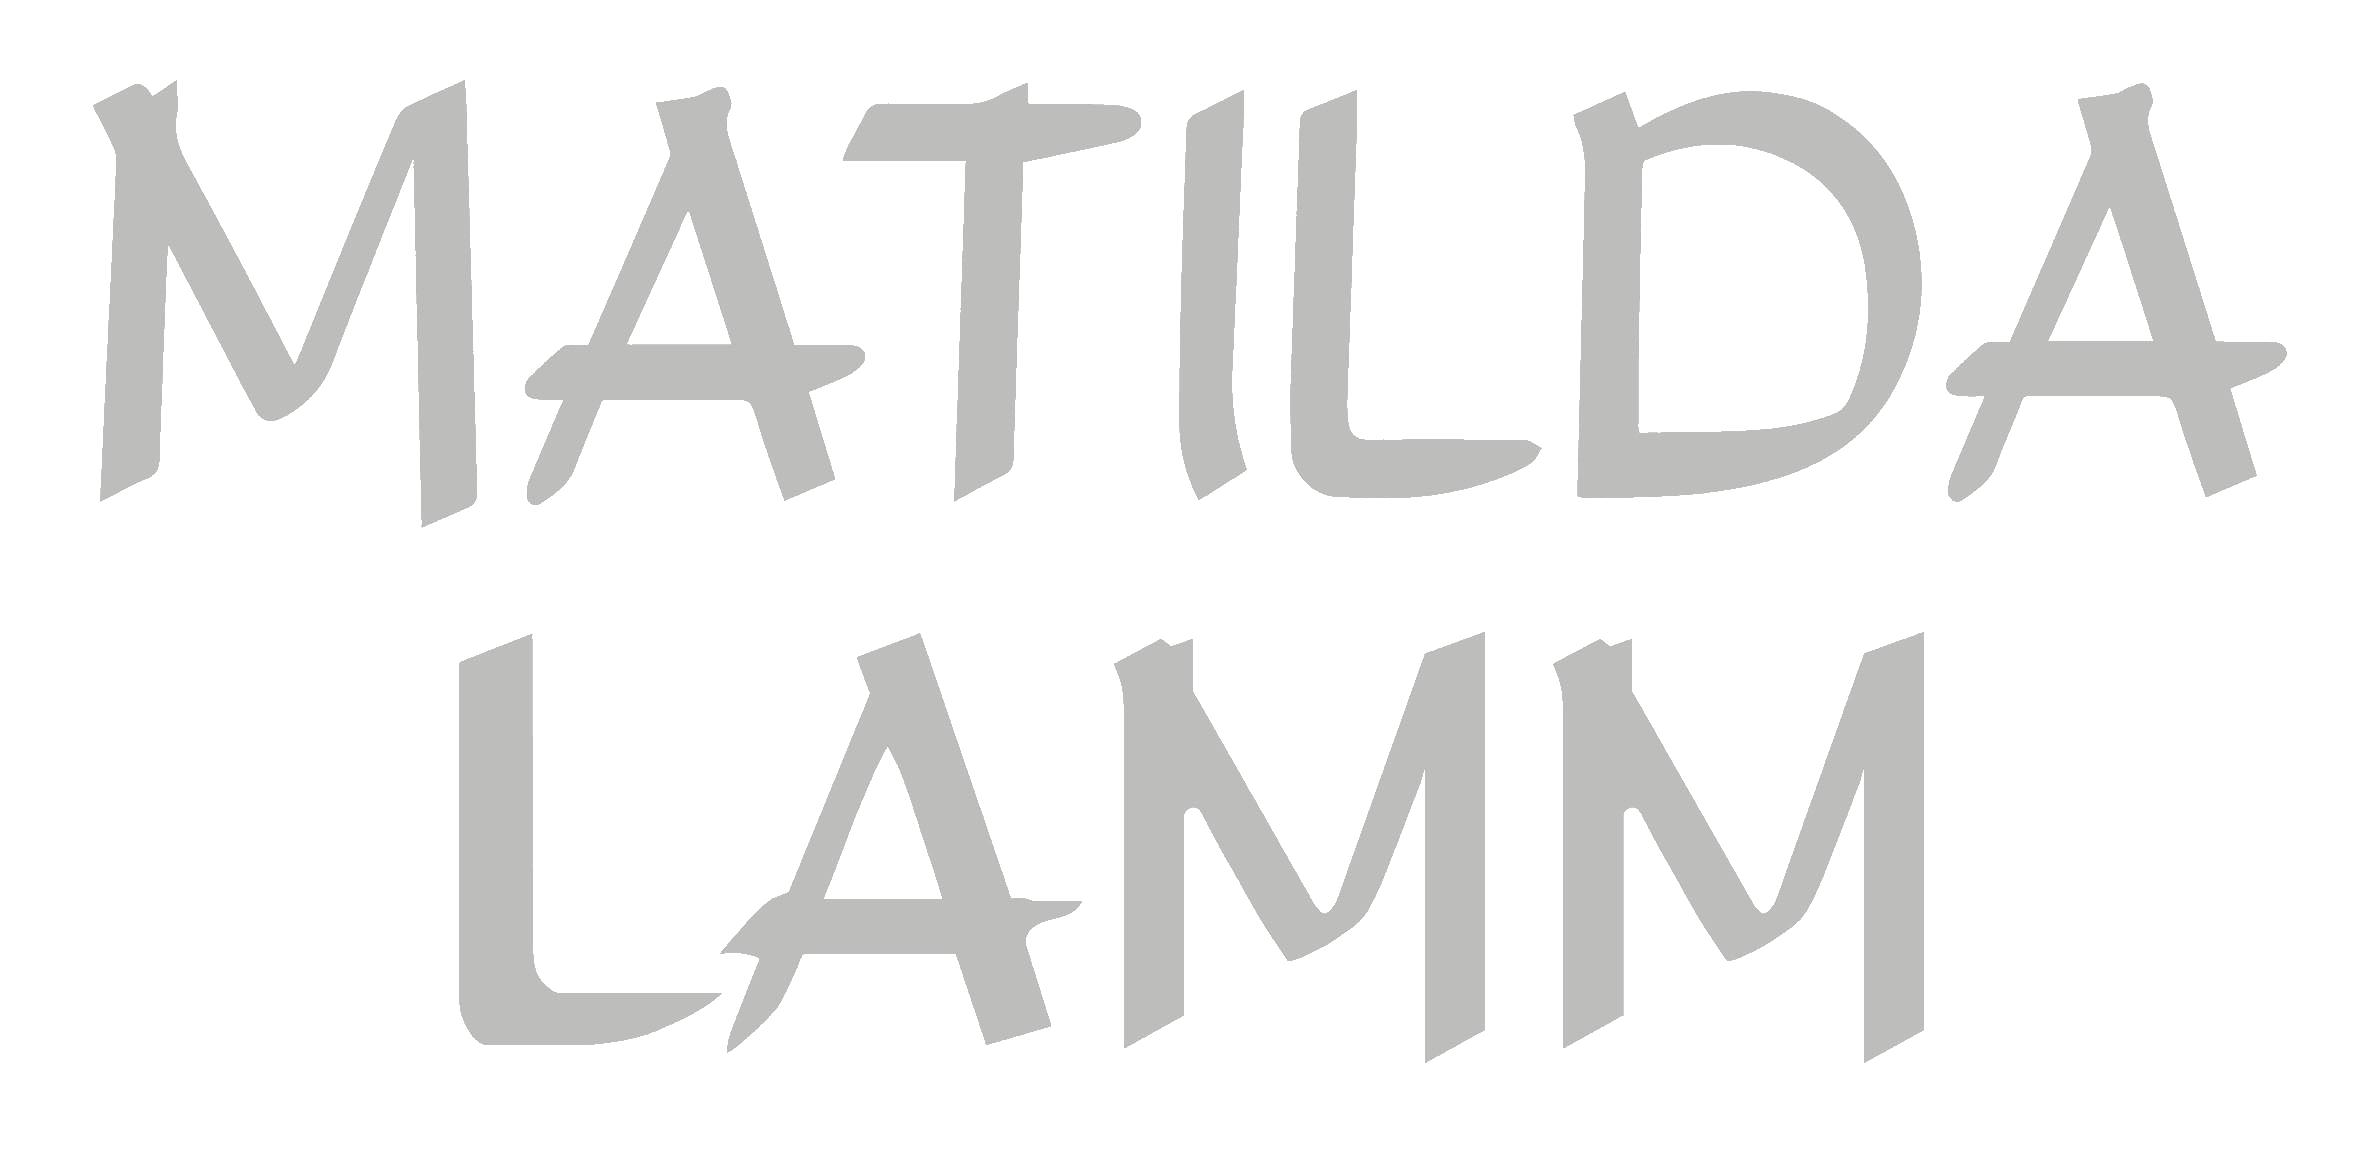 Matilda Lamm